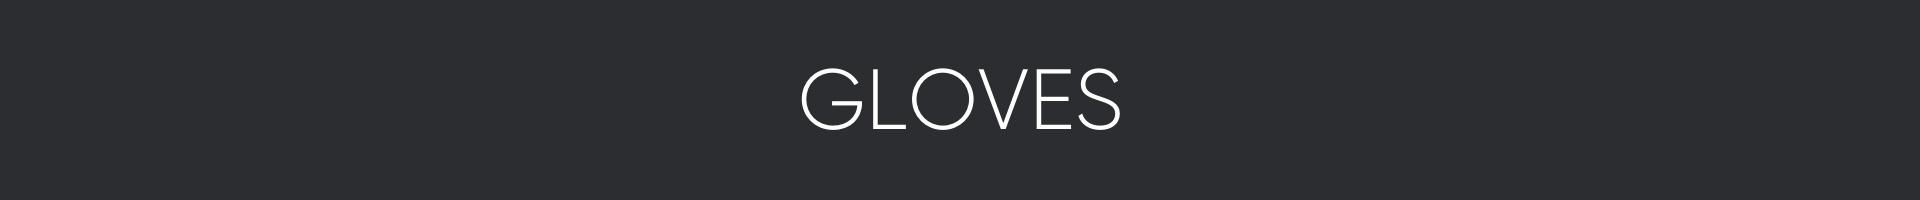 Gloves Banner